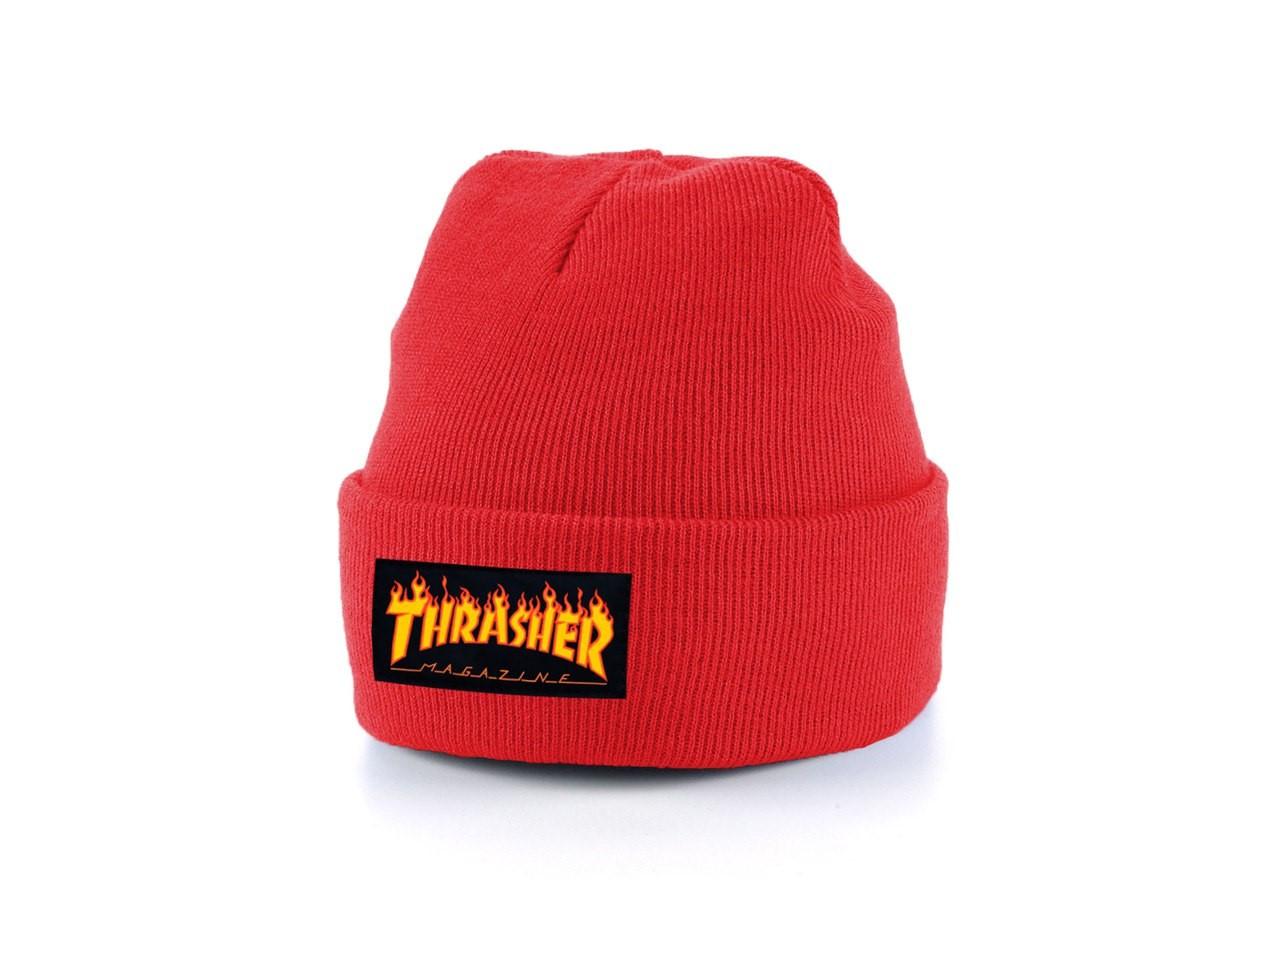 Мужская теплая шапка Thrasher универсальный размер